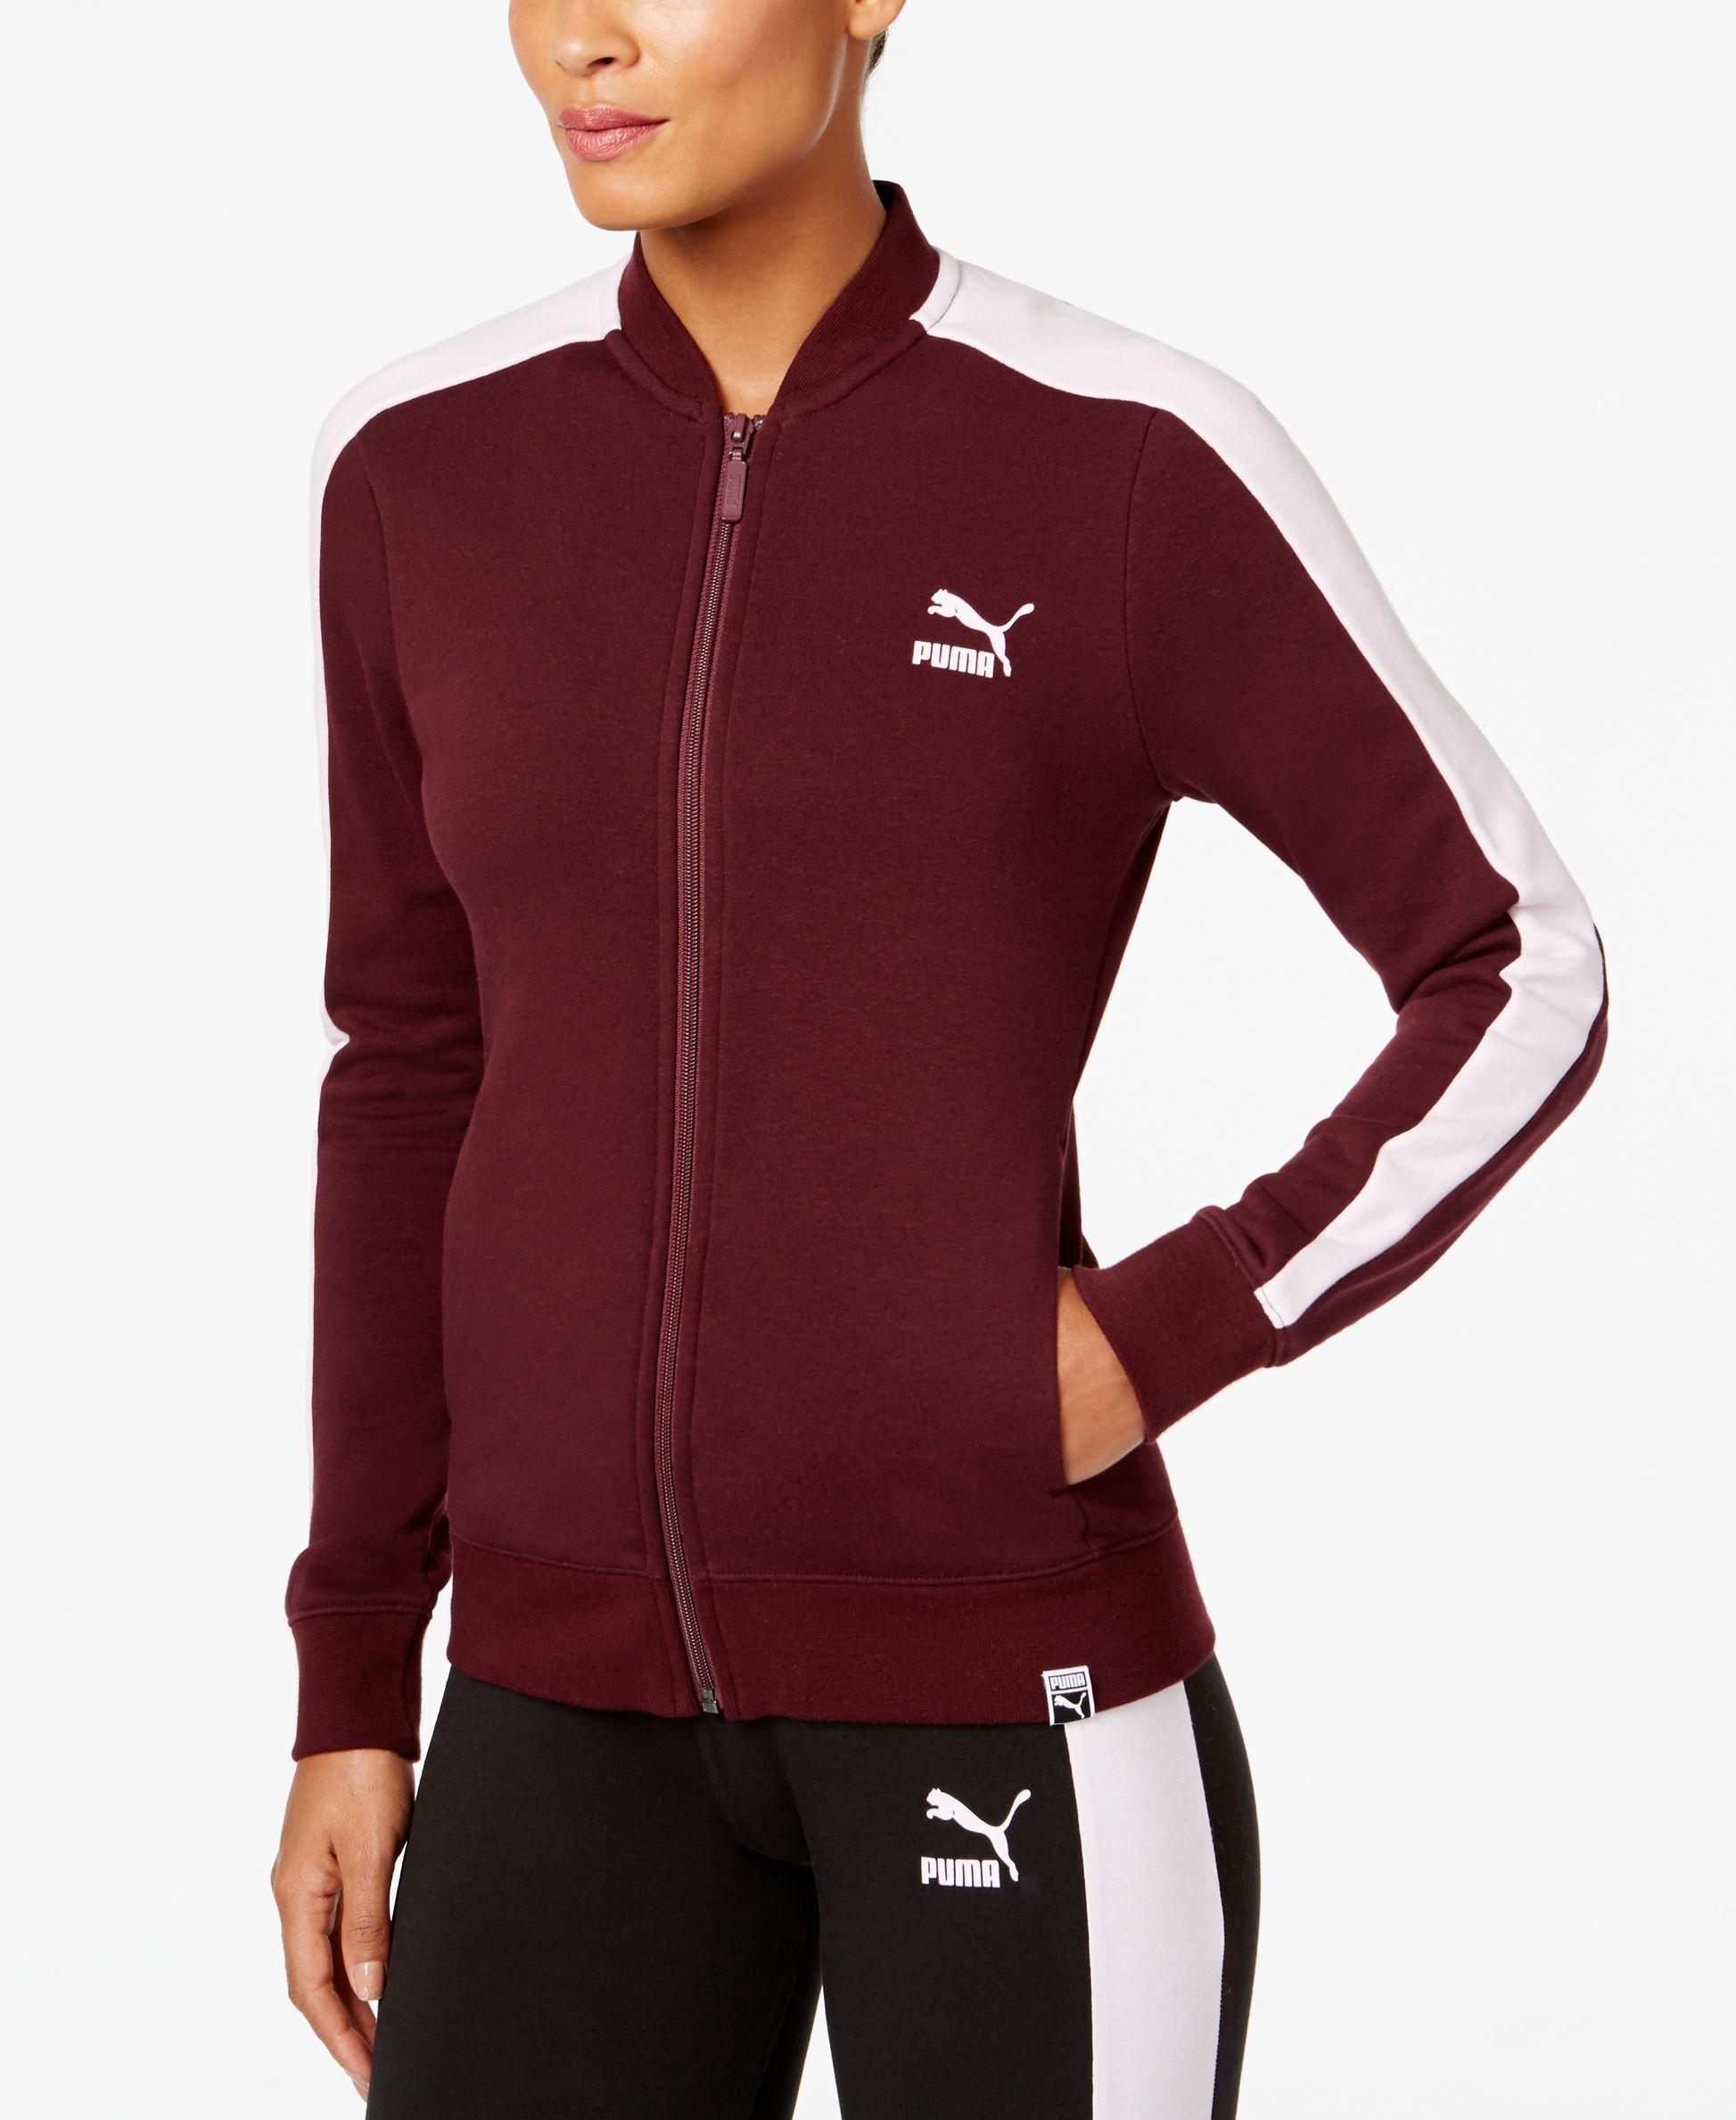 9c368e4b Puma T7 Track Jacket | Jackets | Jackets, Jackets for women, Blazer ...